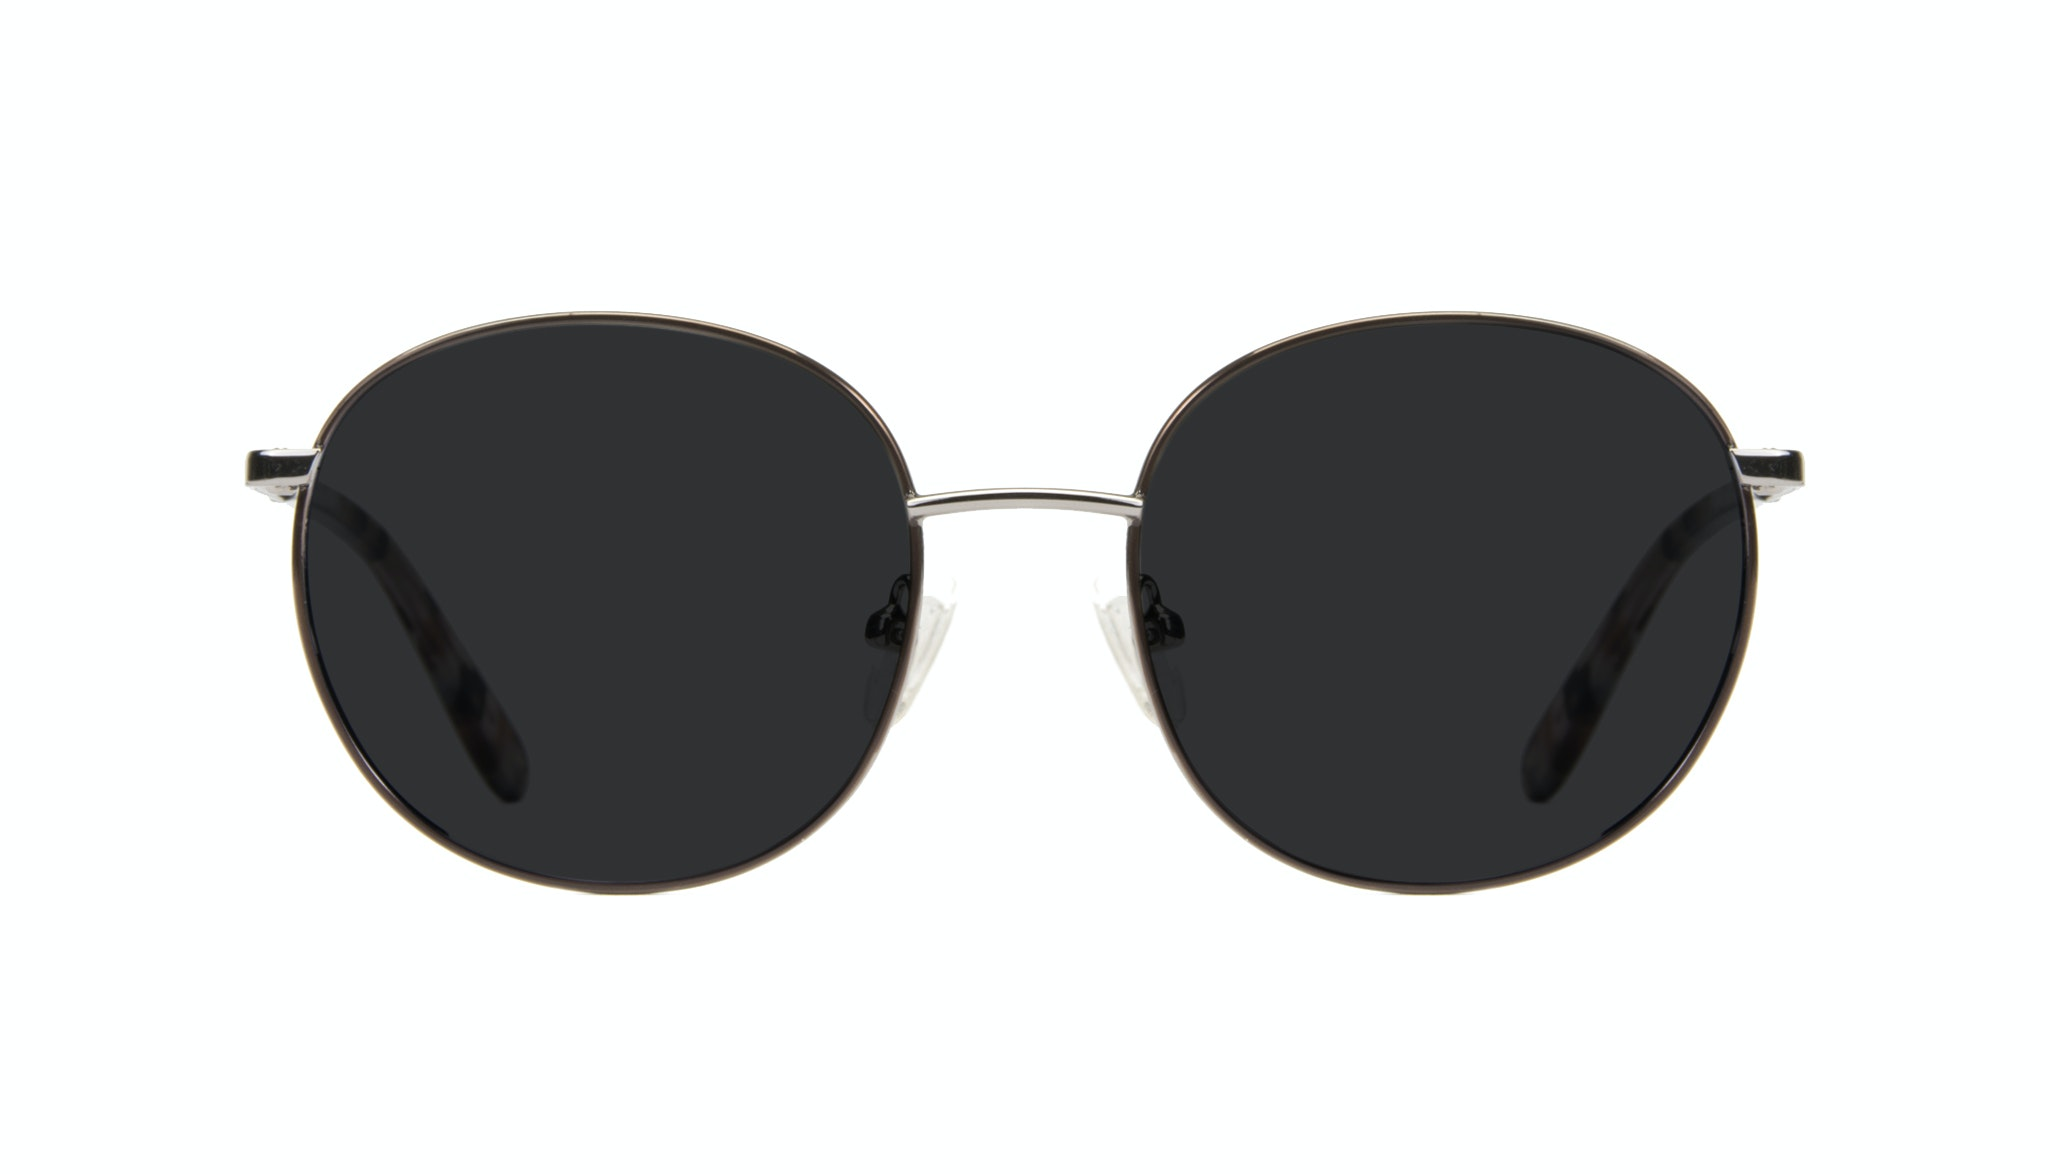 Affordable Fashion Glasses Round Eyeglasses Women Joy Rose Metal